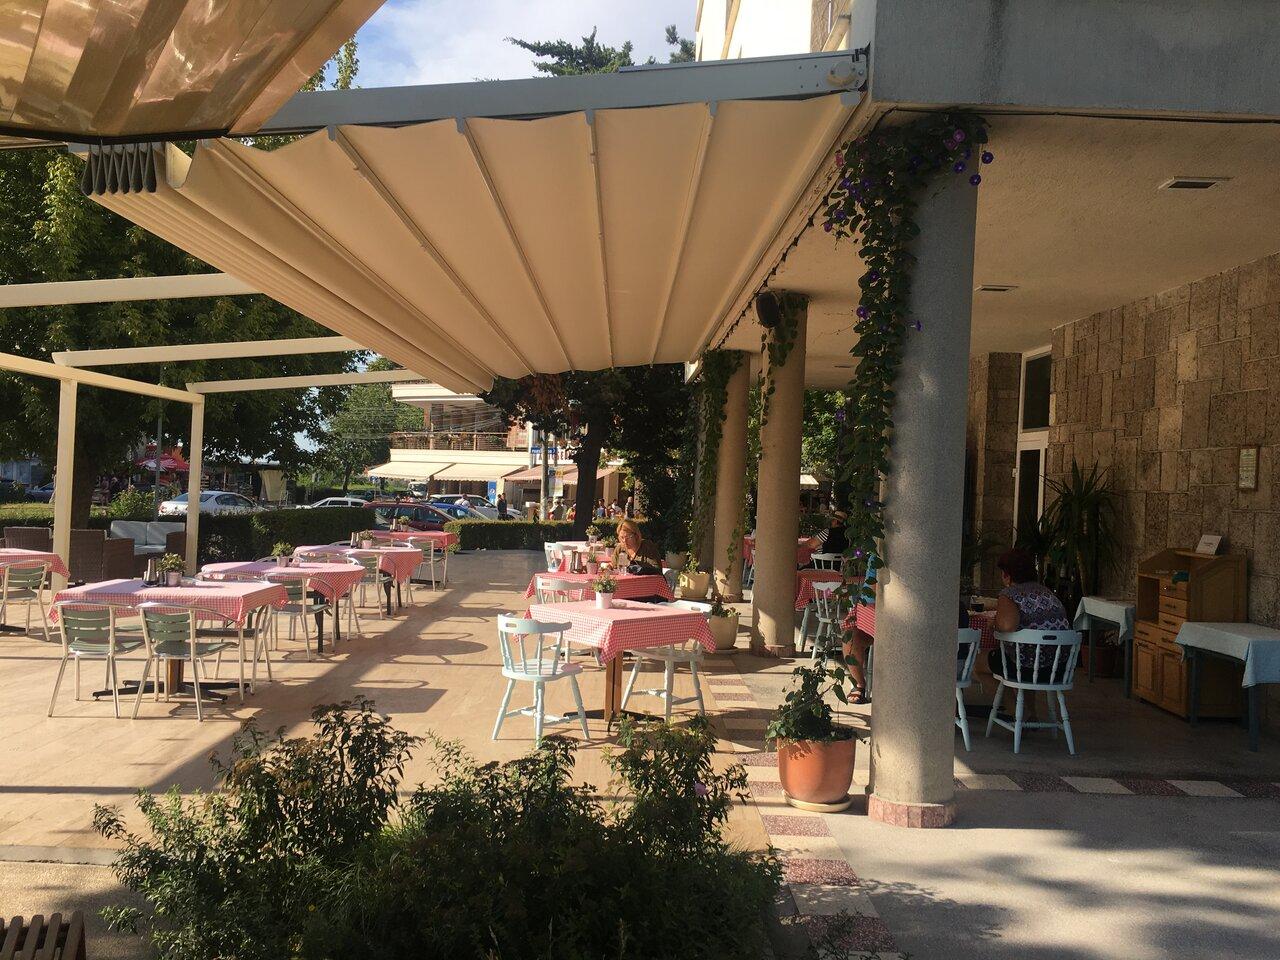 HOTEL CARMEN - Pensiune Completa- 5 nopti